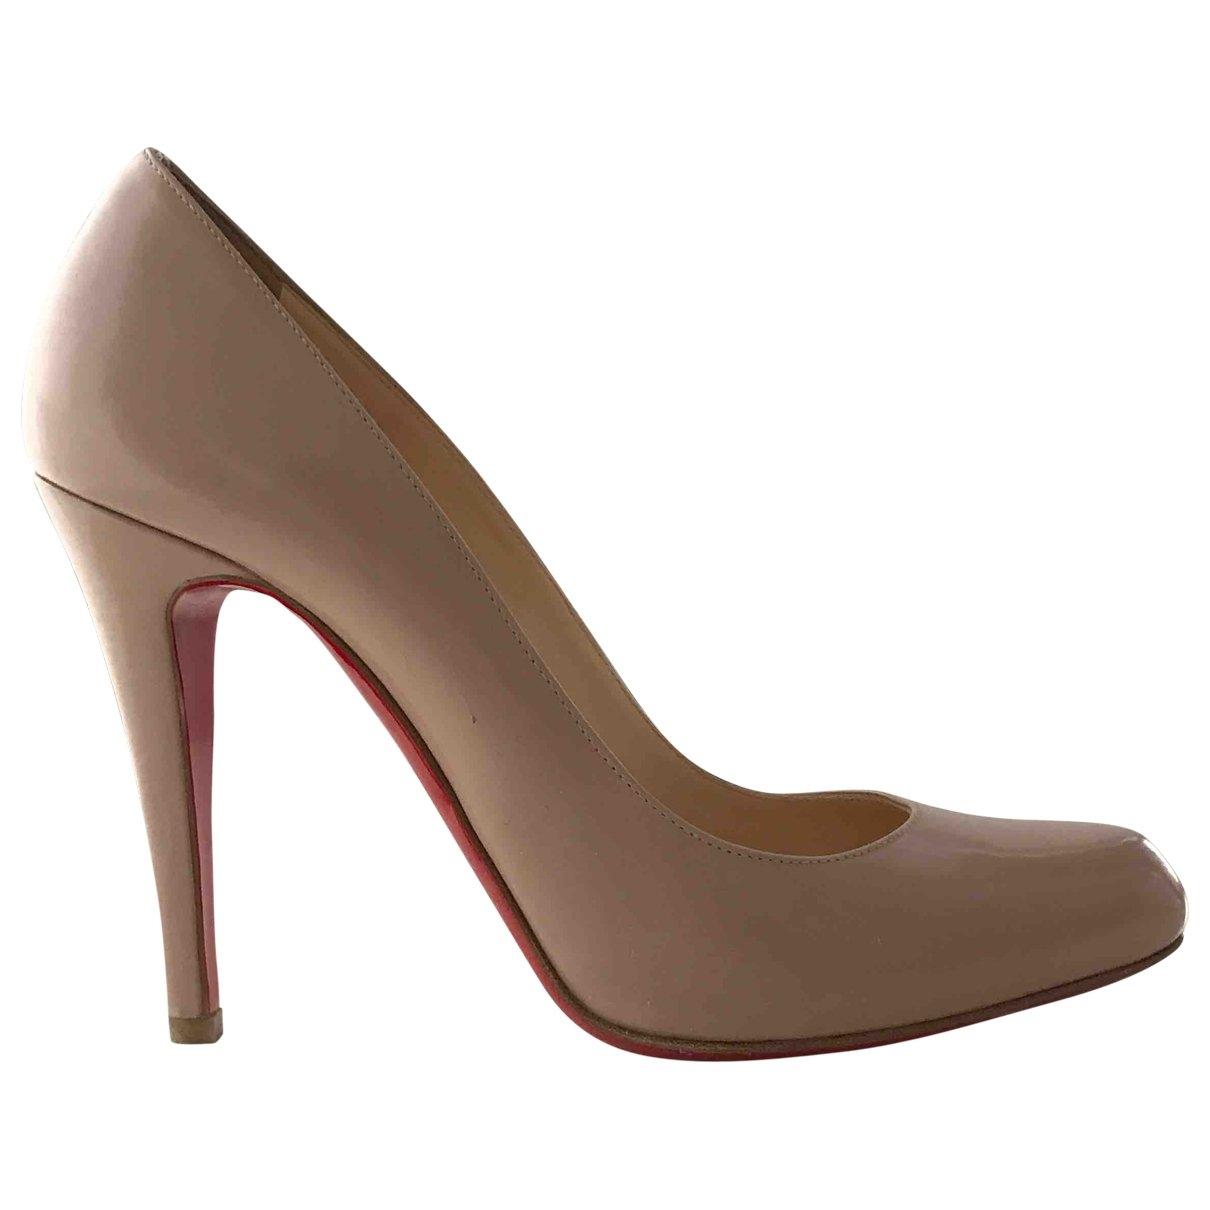 Christian Louboutin \N Beige Leather Heels for Women 39 EU